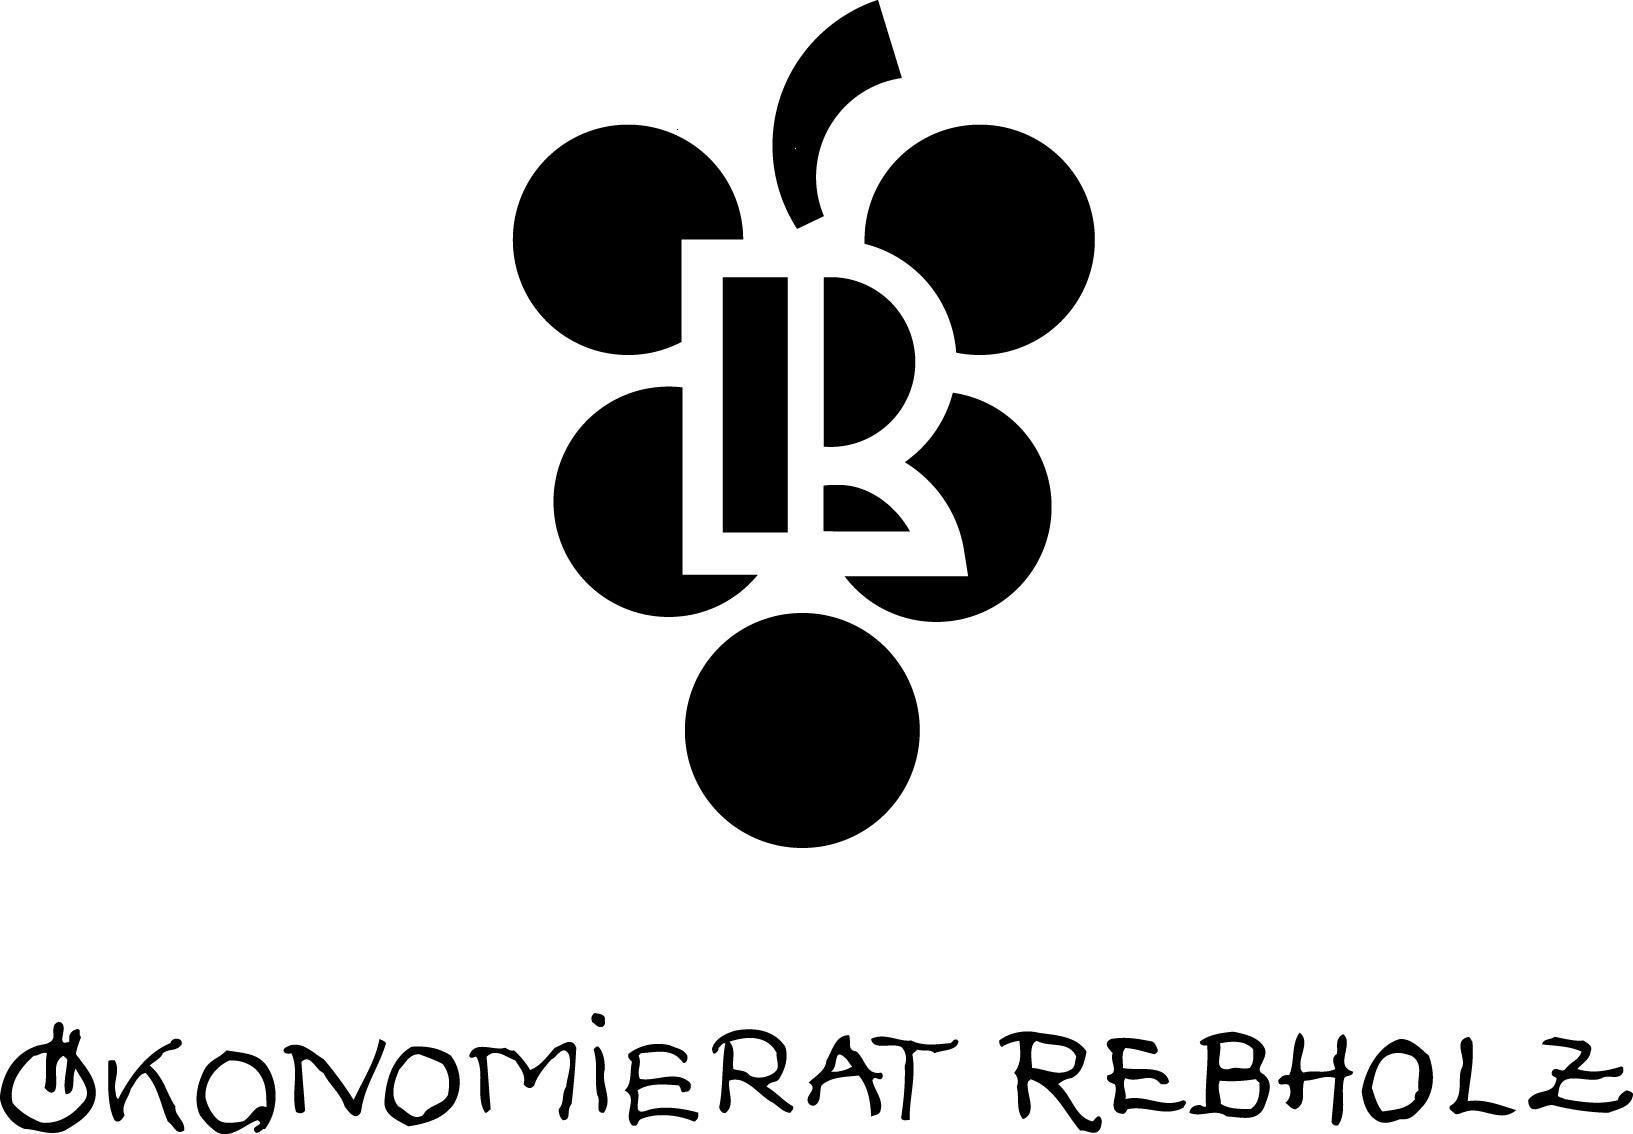 OEKONOMIERAT REBHOLZ (VDP - Pfalz)